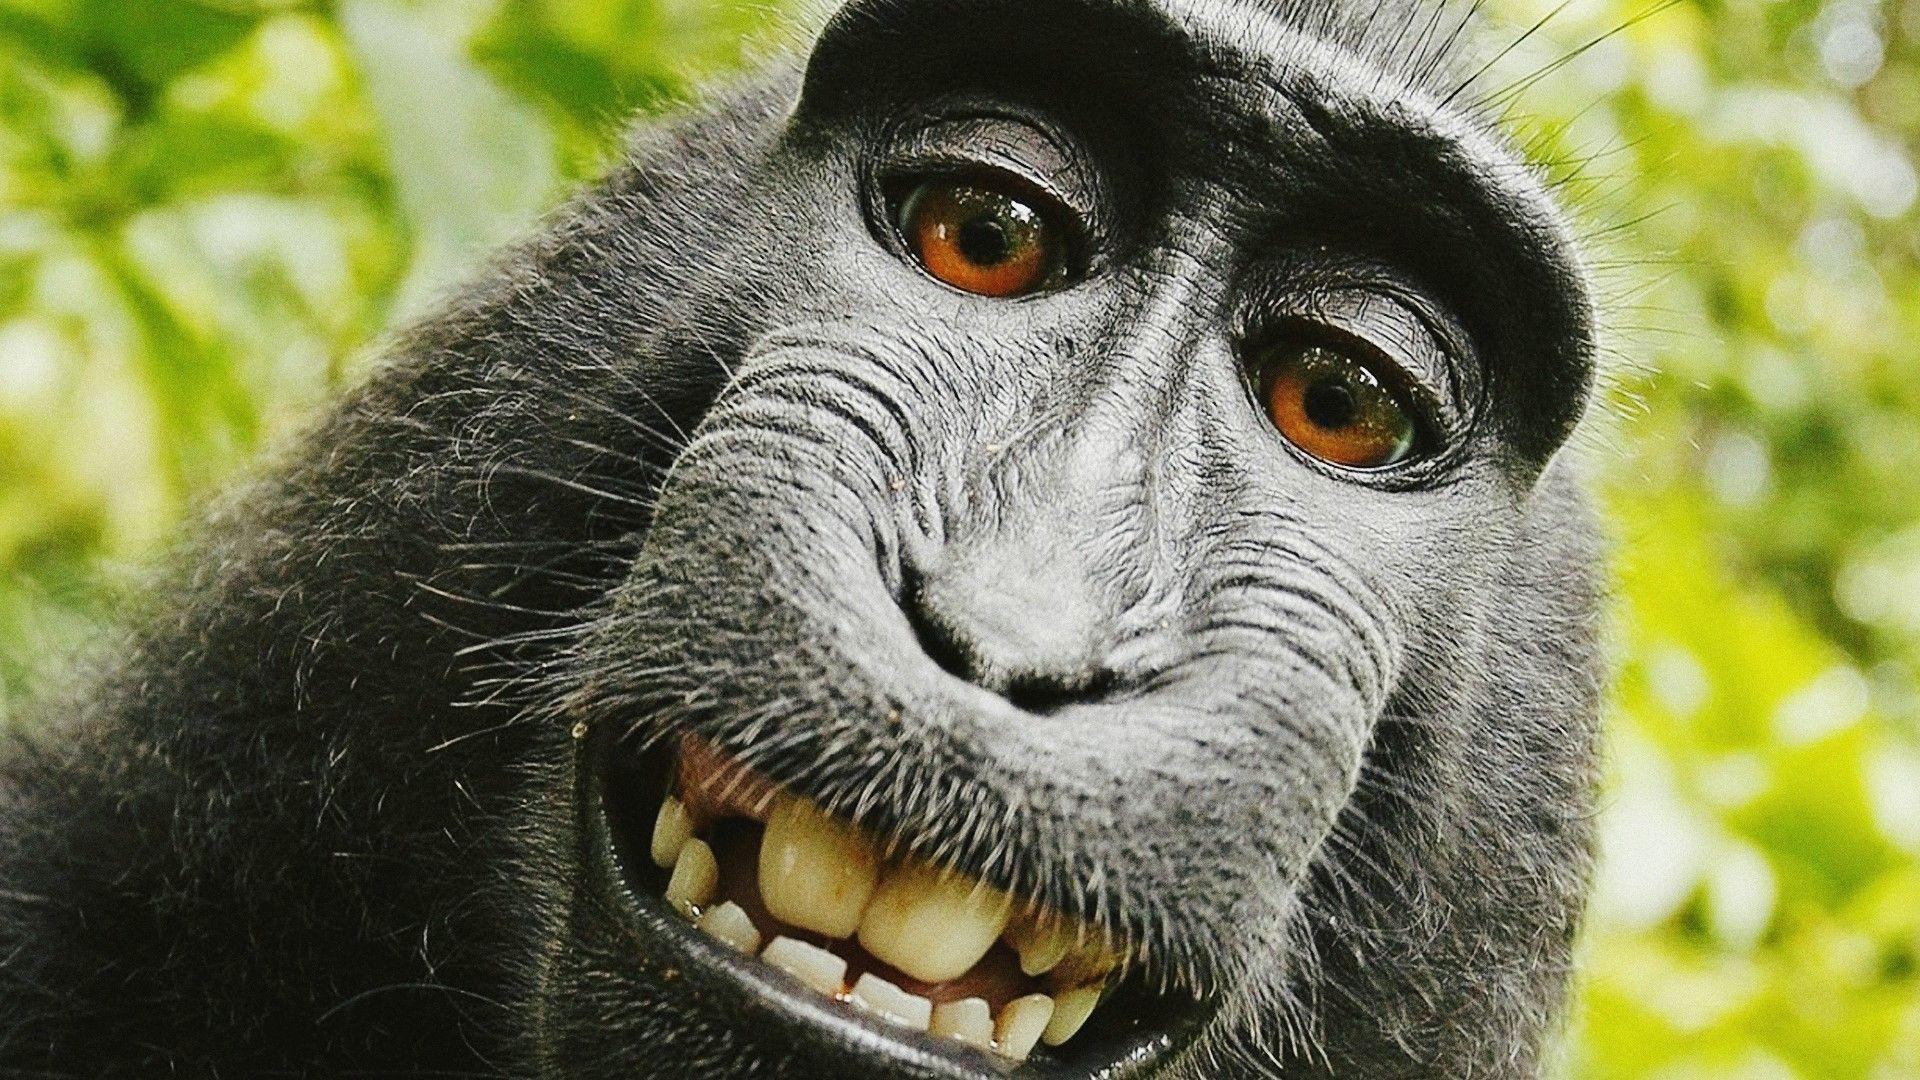 Monkey Wallpapers Top Free Monkey Backgrounds Wallpaperaccess